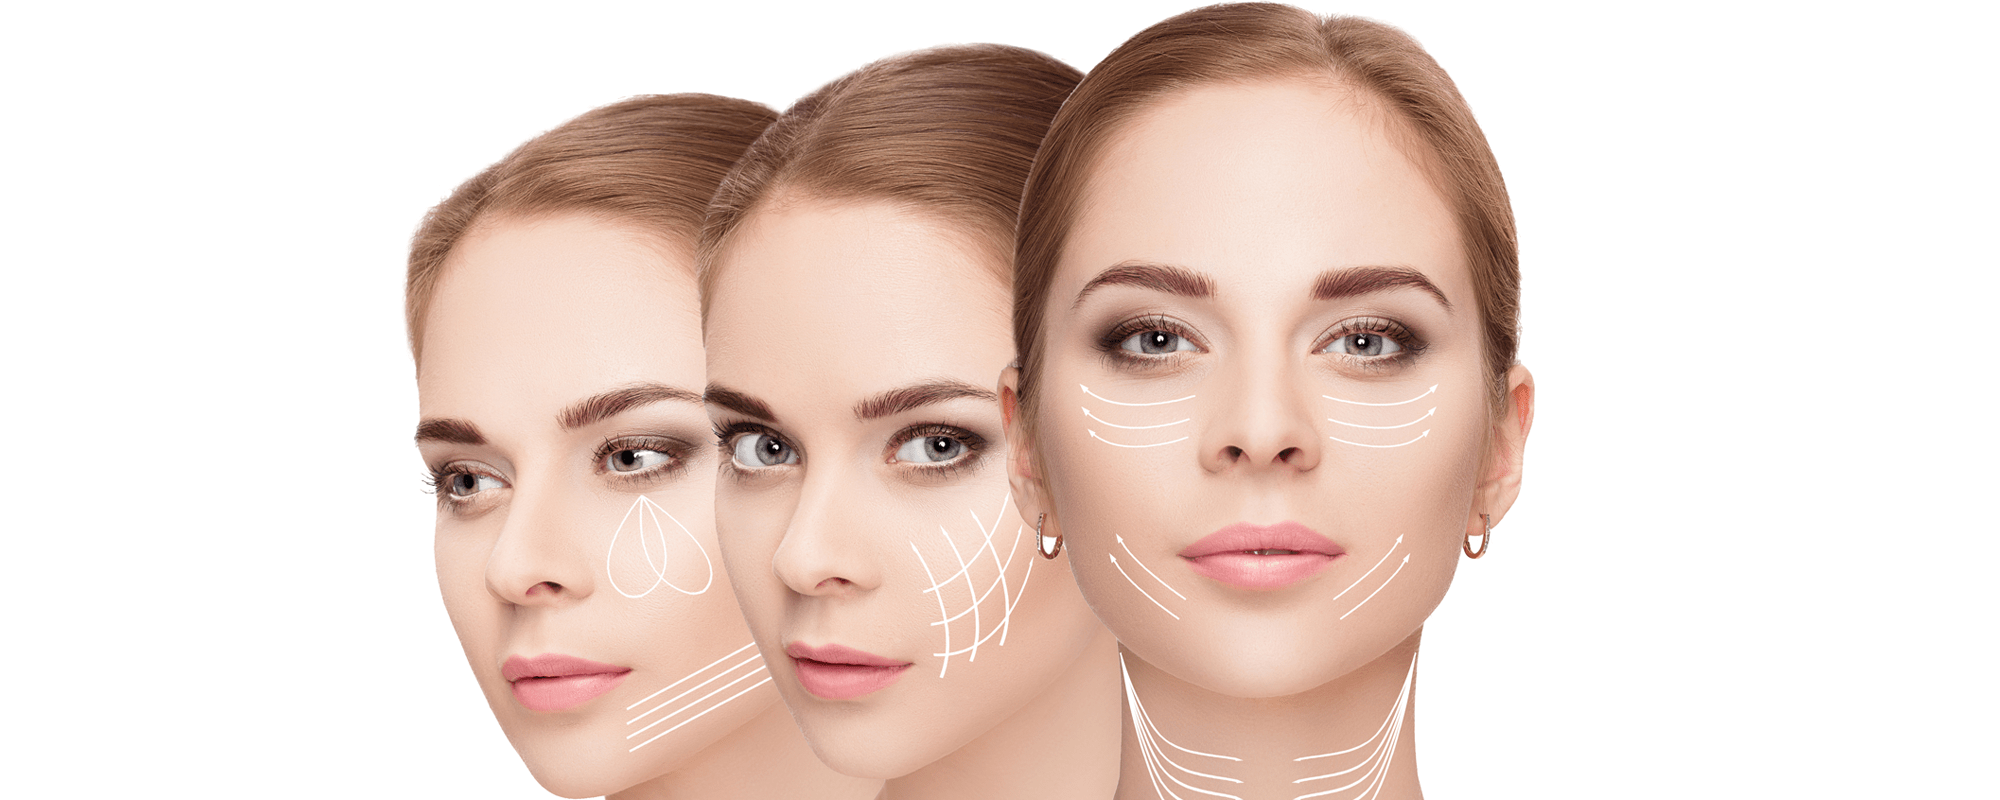 Clínica Cirugía Plástica Facial Clínica Mandri